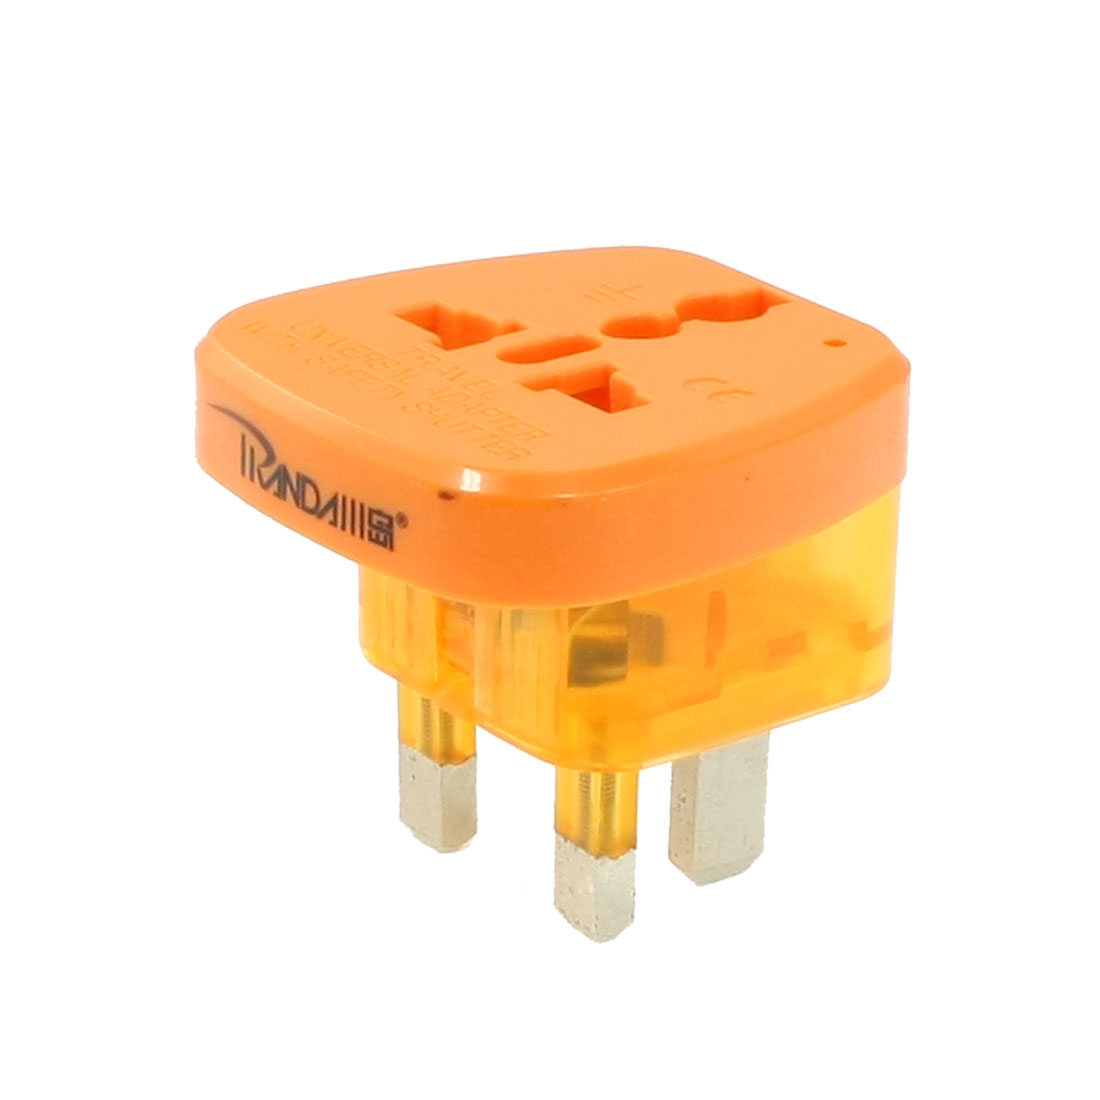 Orange 3 Pin UK Plug to EU US AU Socket Travel Adapter AC 250V 13A